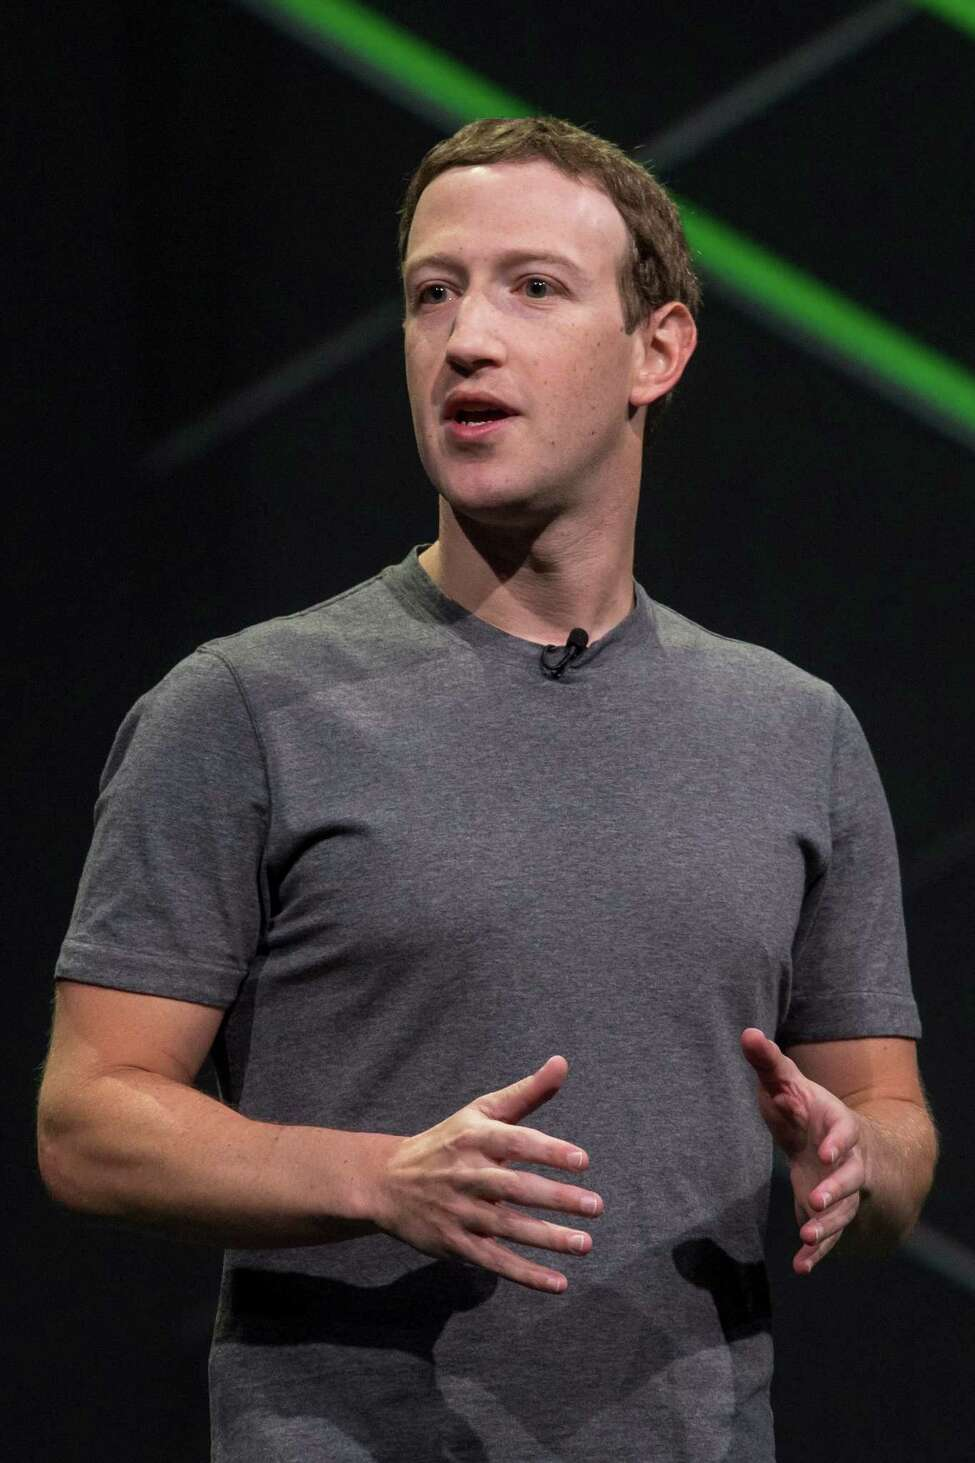 David Zuckerberg